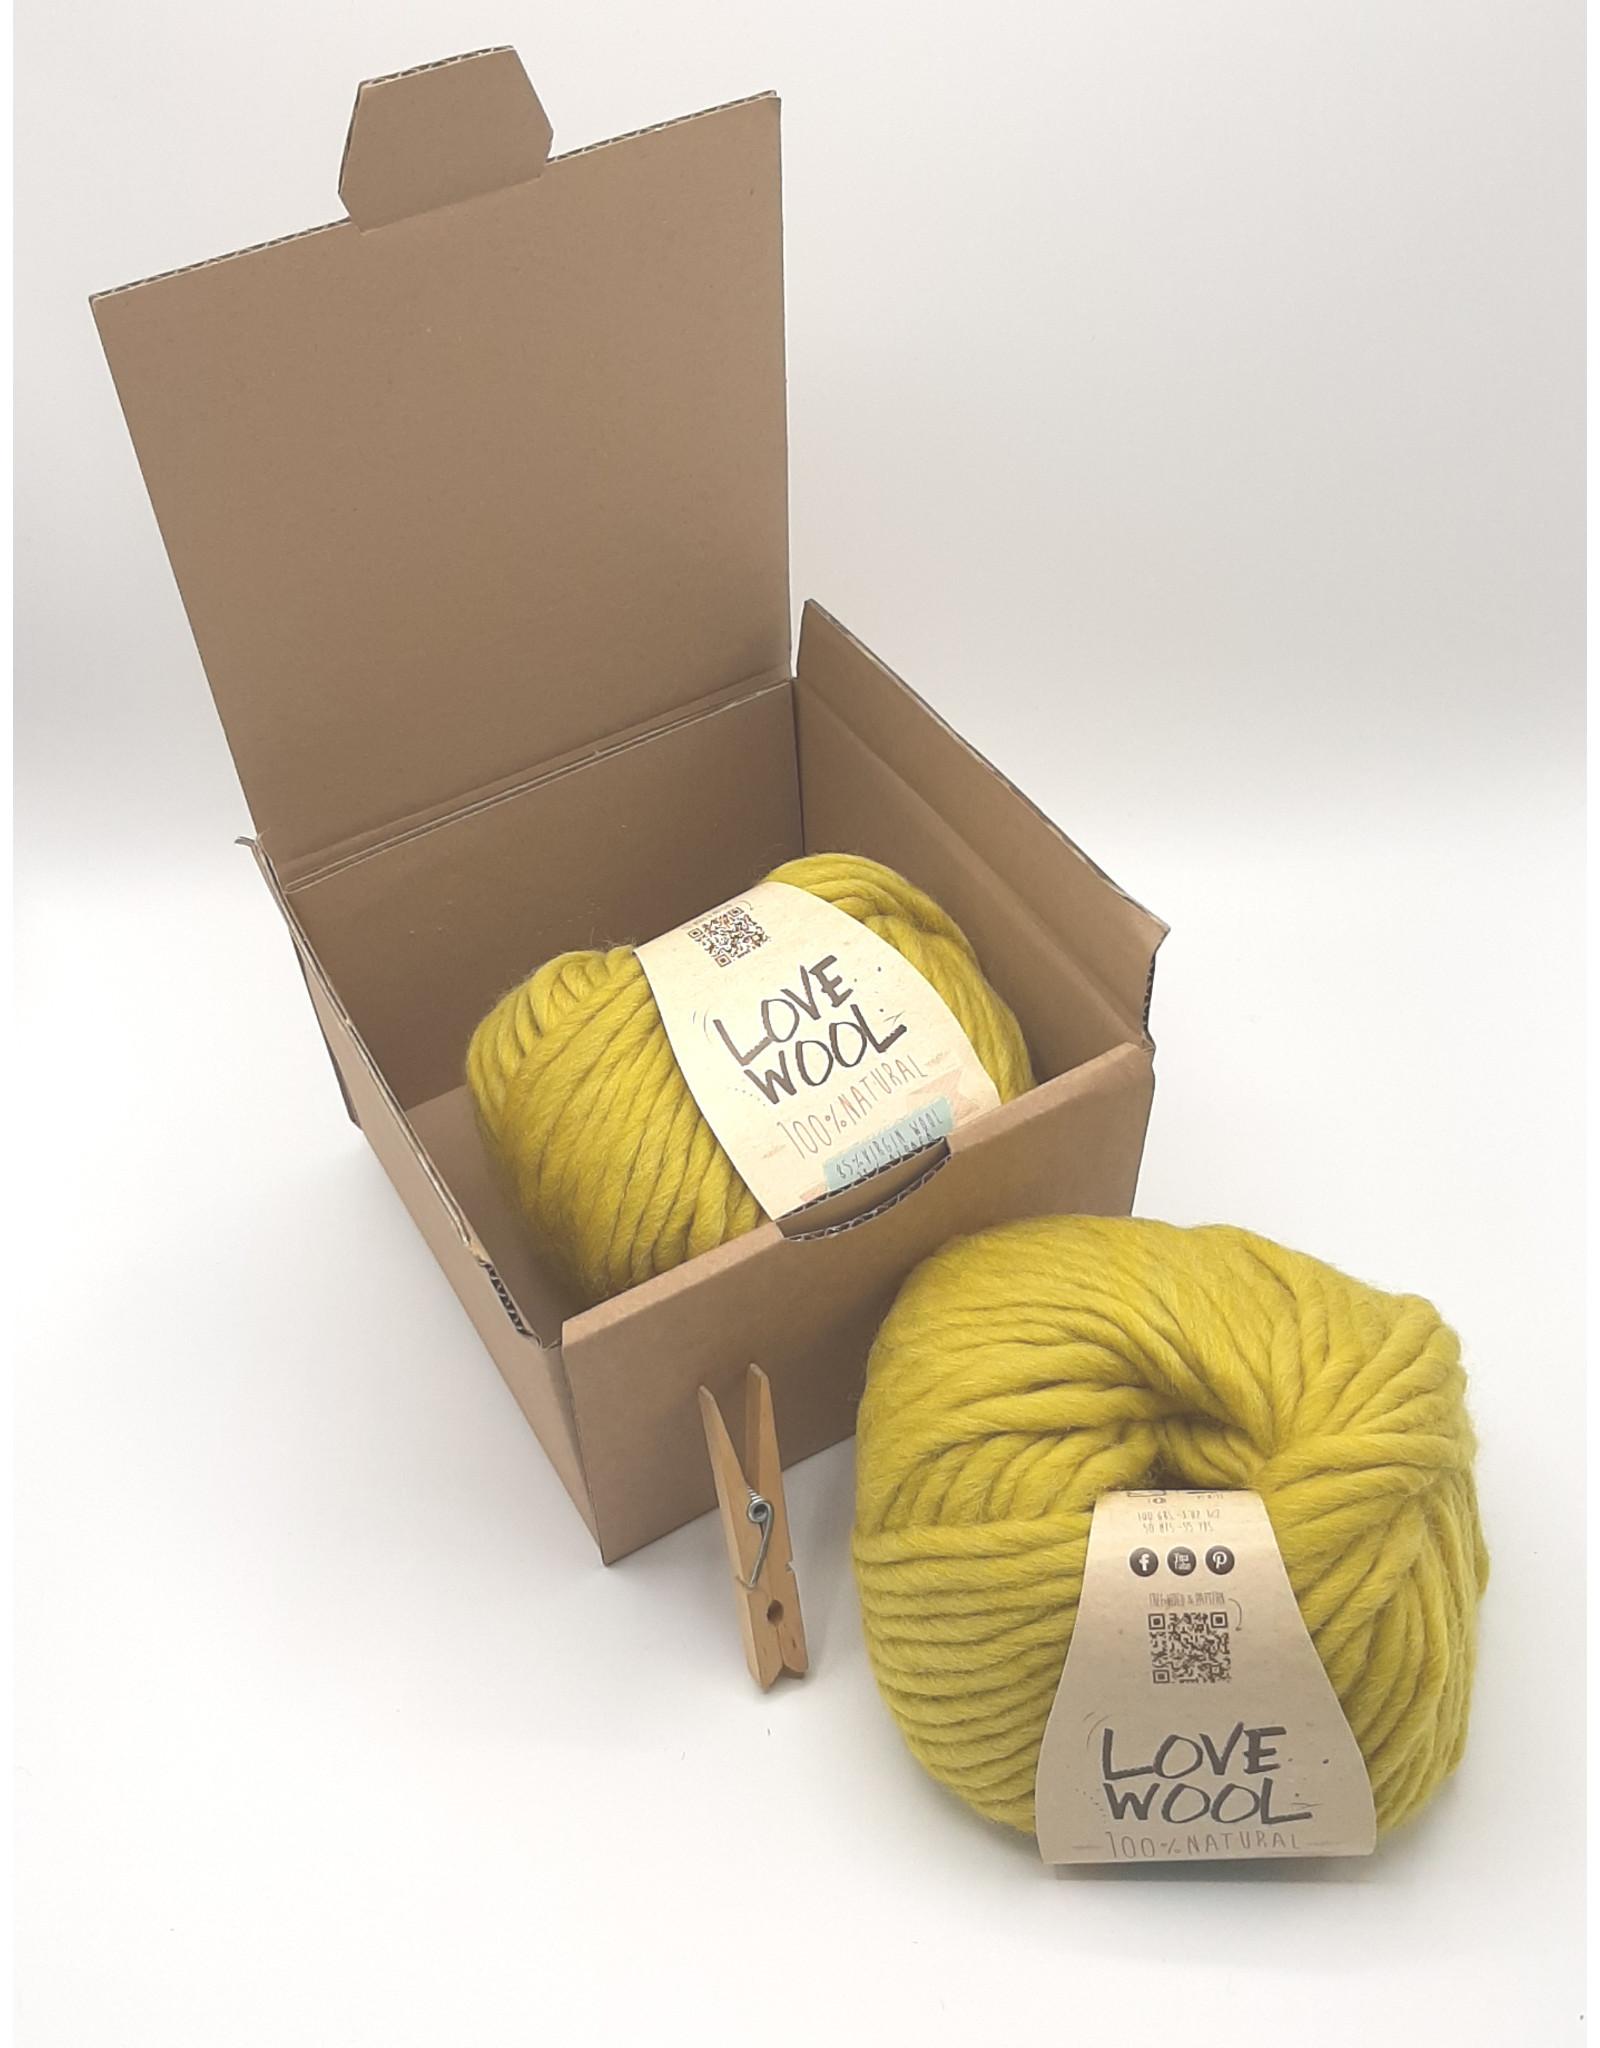 Katia Katia - Love Wool - 112 - Oker - bundel 2 bollen x 100 gr.